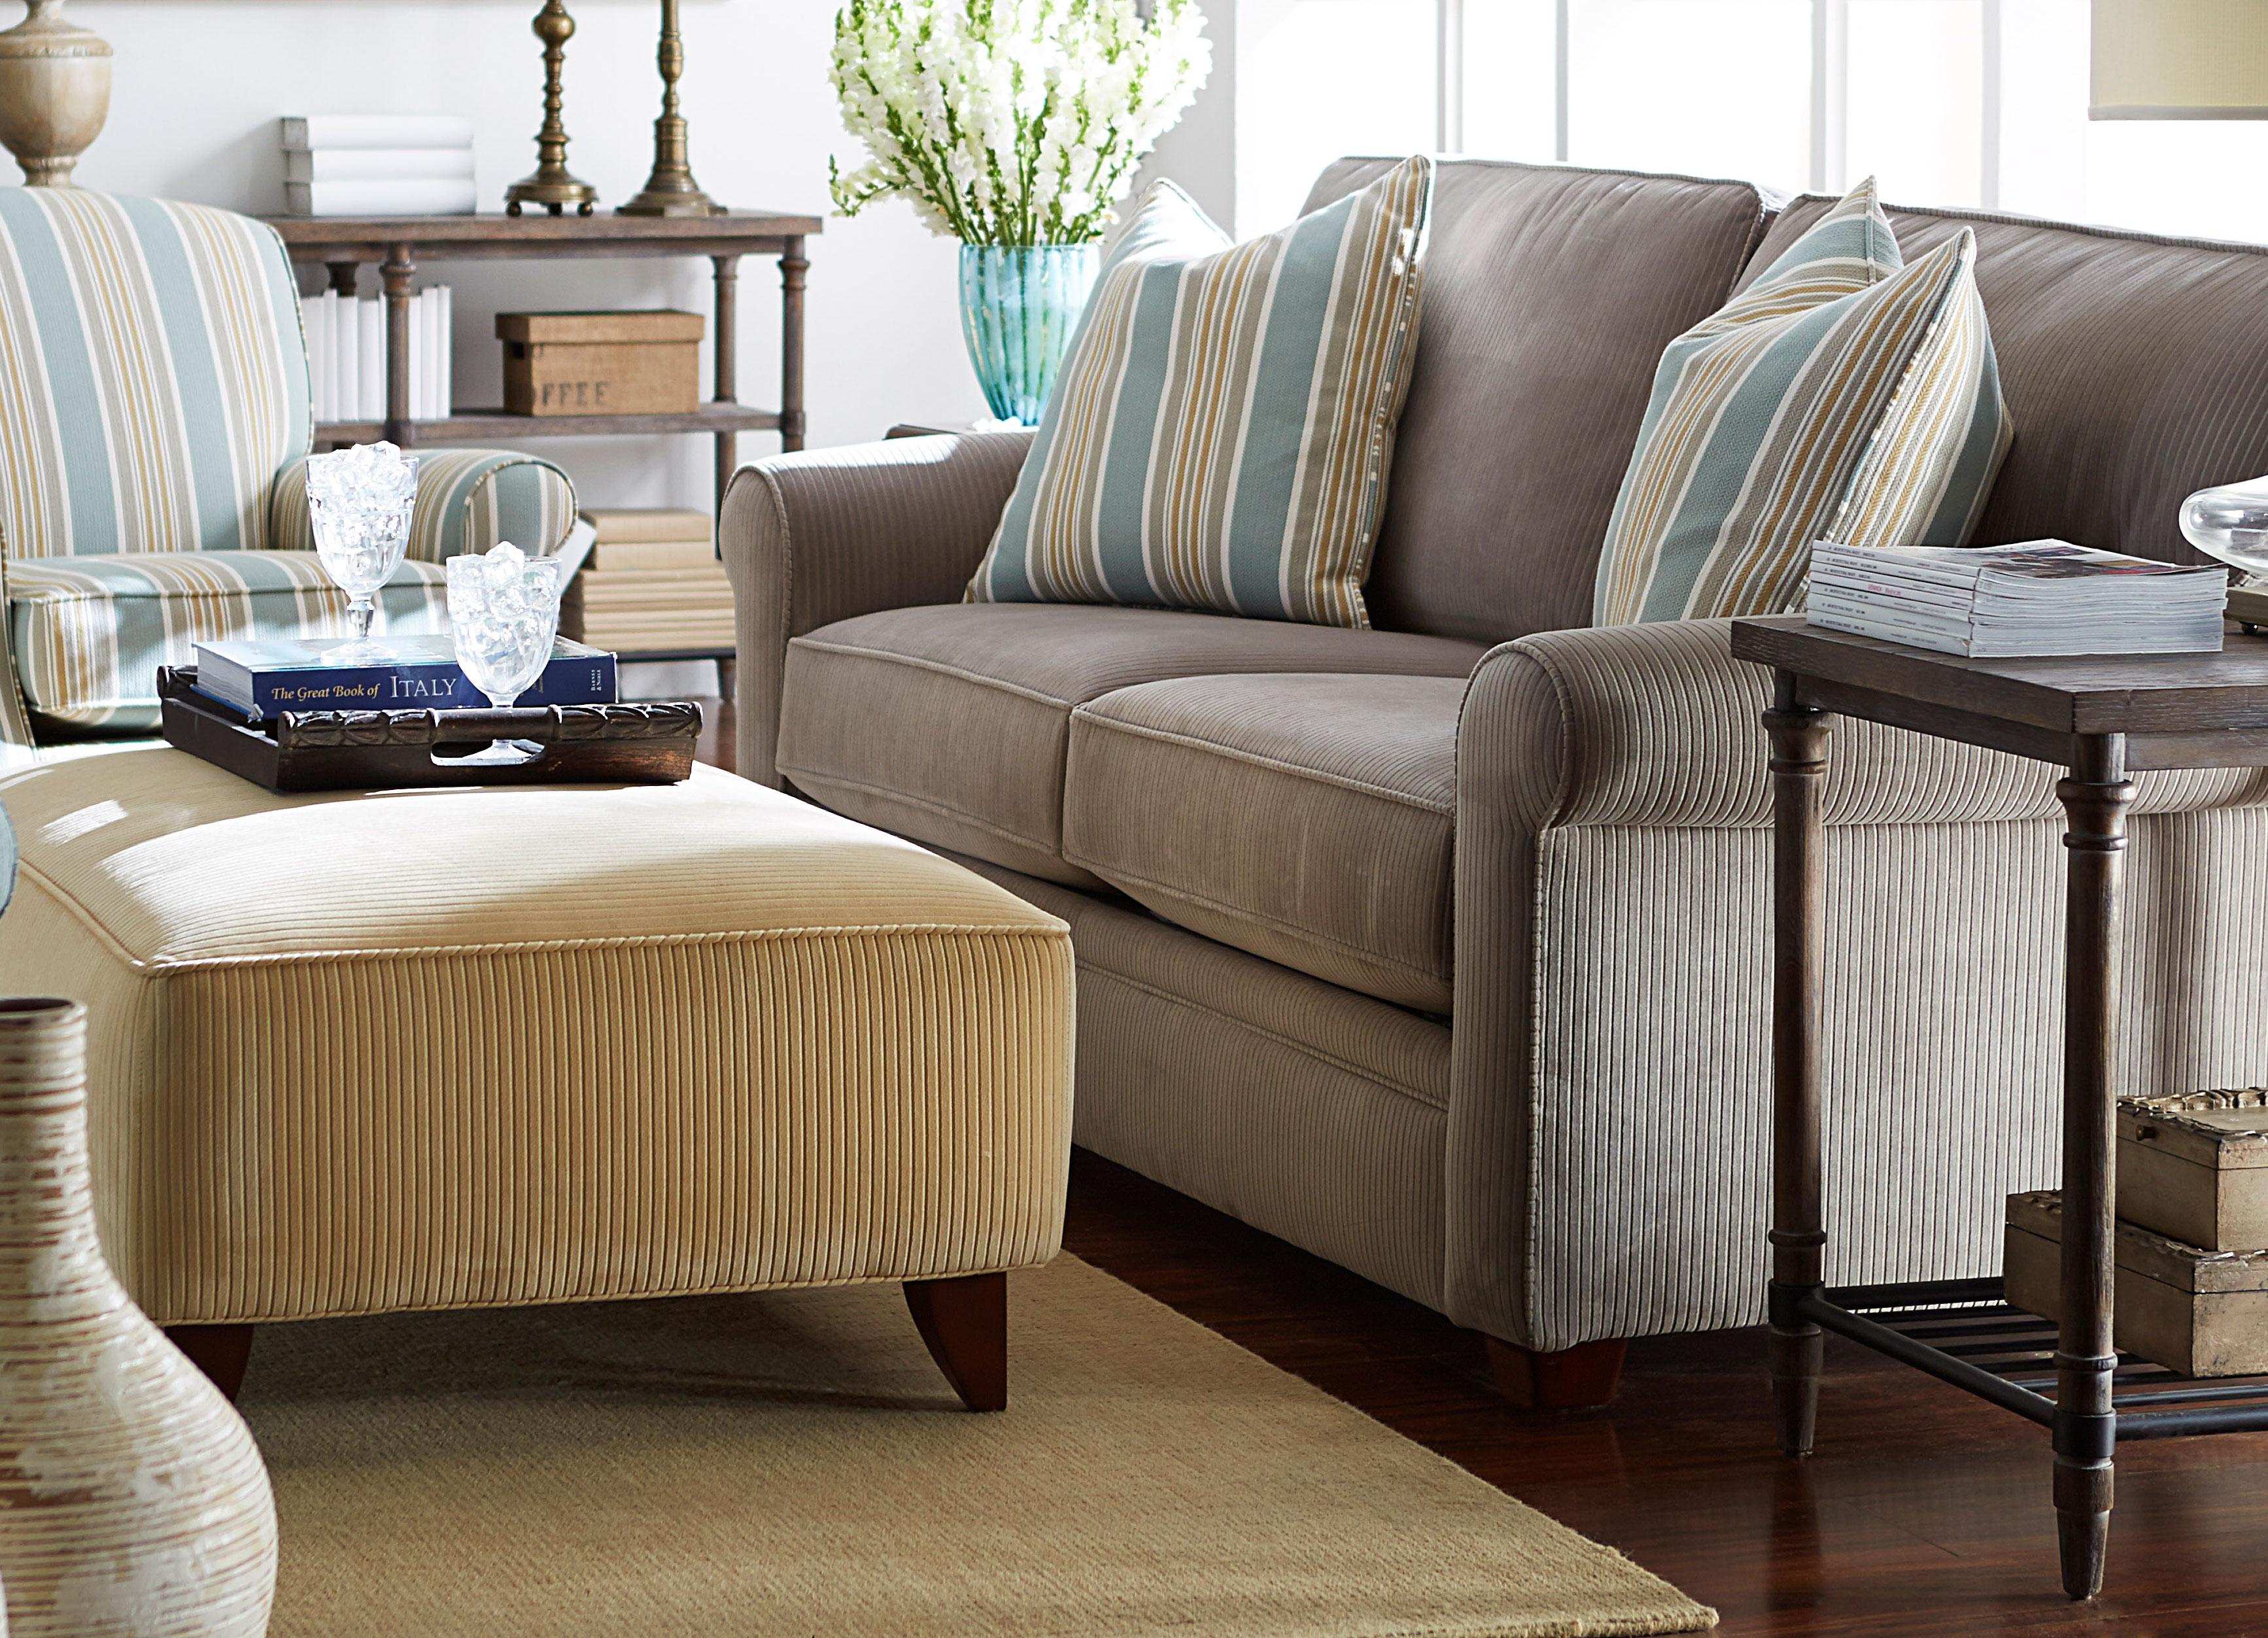 leon s mackenzie sofa cartoon picture sklar peppler quality furniture ajax sofas sectionals